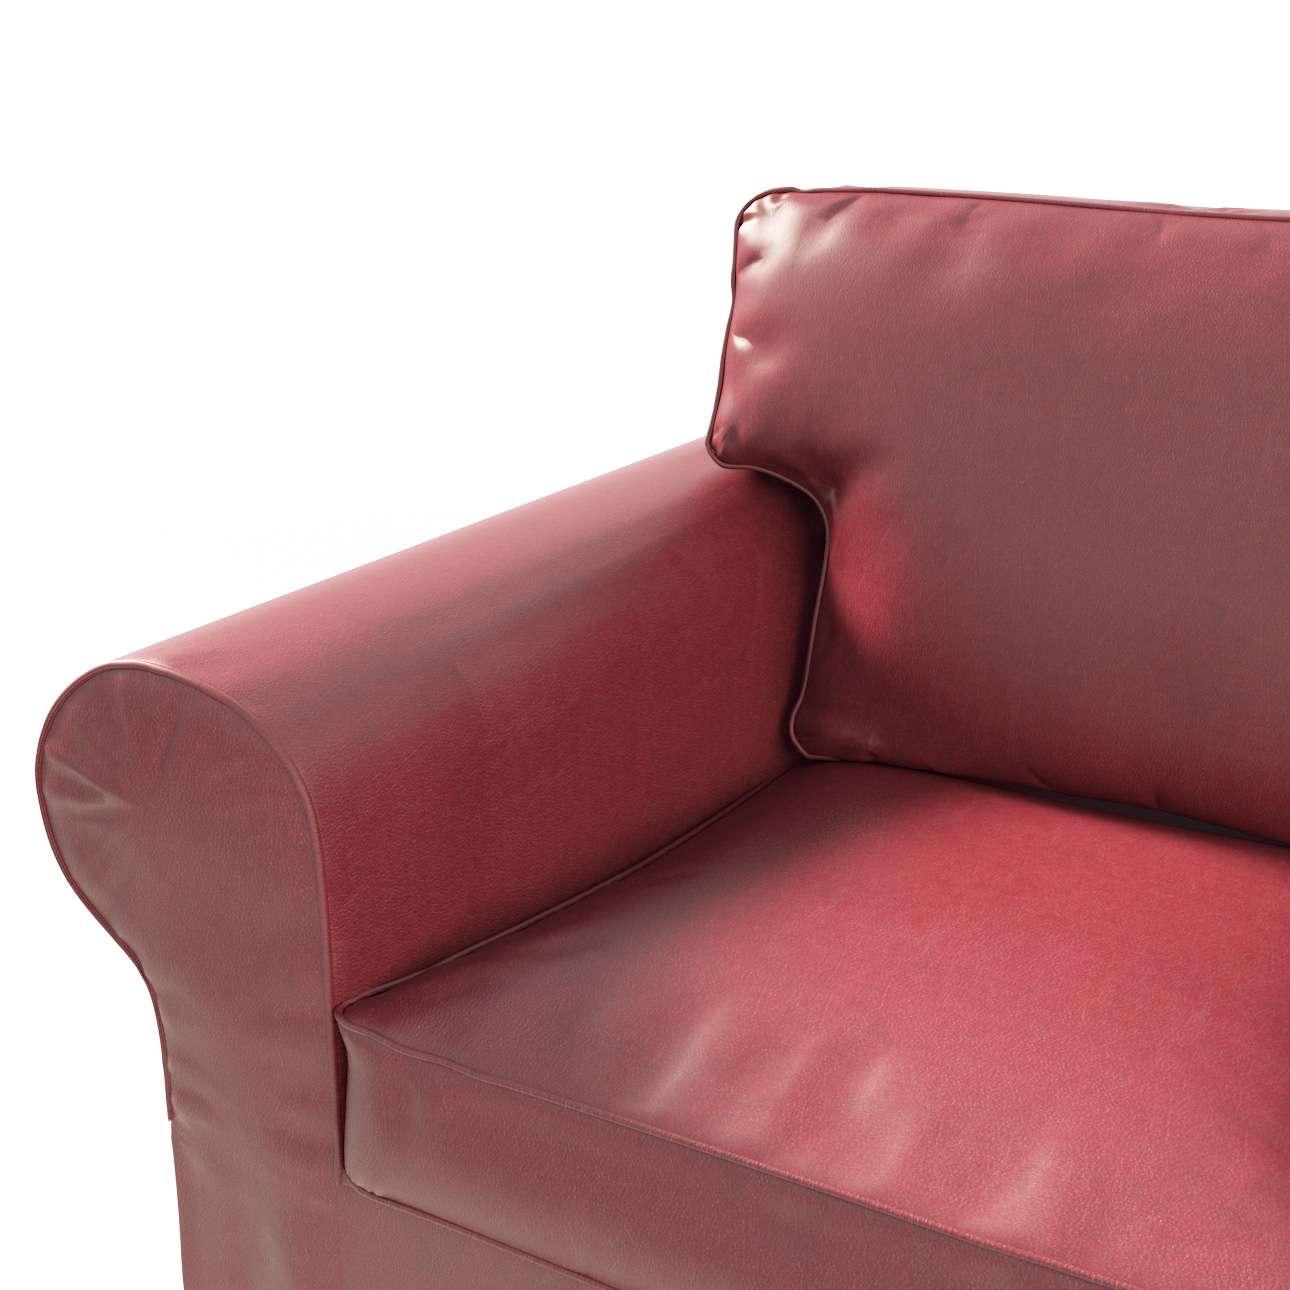 Ektorp 2-Sitzer Sofabezug nicht ausklappbar Sofabezug für  Ektorp 2-Sitzer nicht ausklappbar von der Kollektion Öko-Leder, Stoff: 104-49